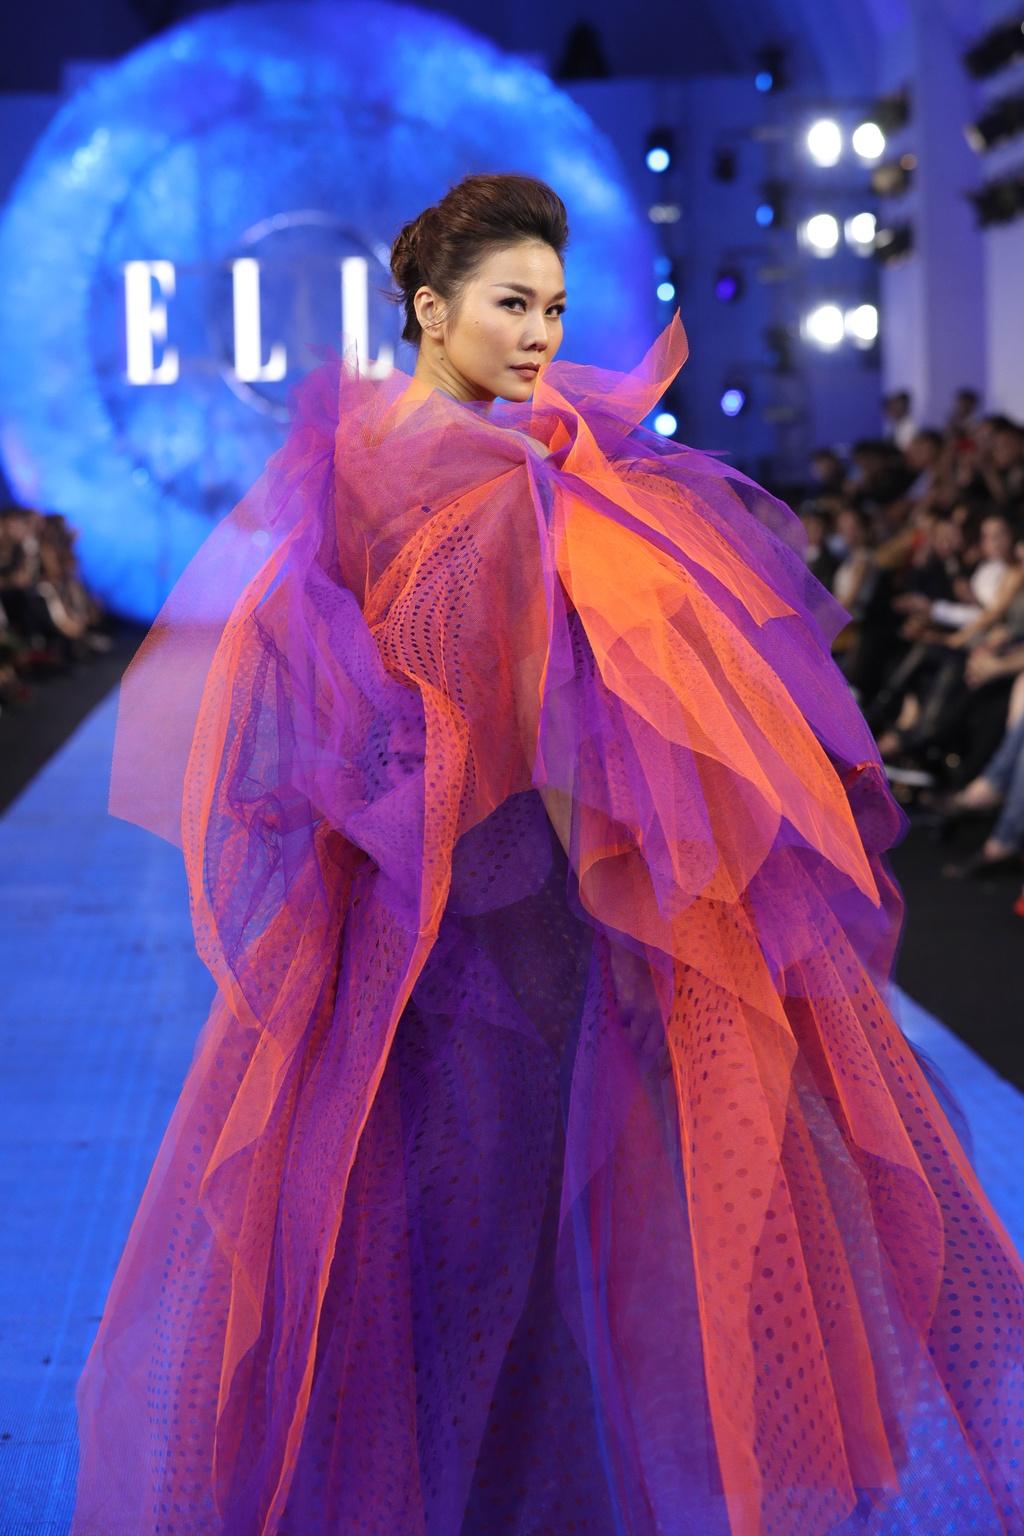 Thanh Hang dien menswear, Chau Bui ca tinh du show thoi trang hinh anh 2